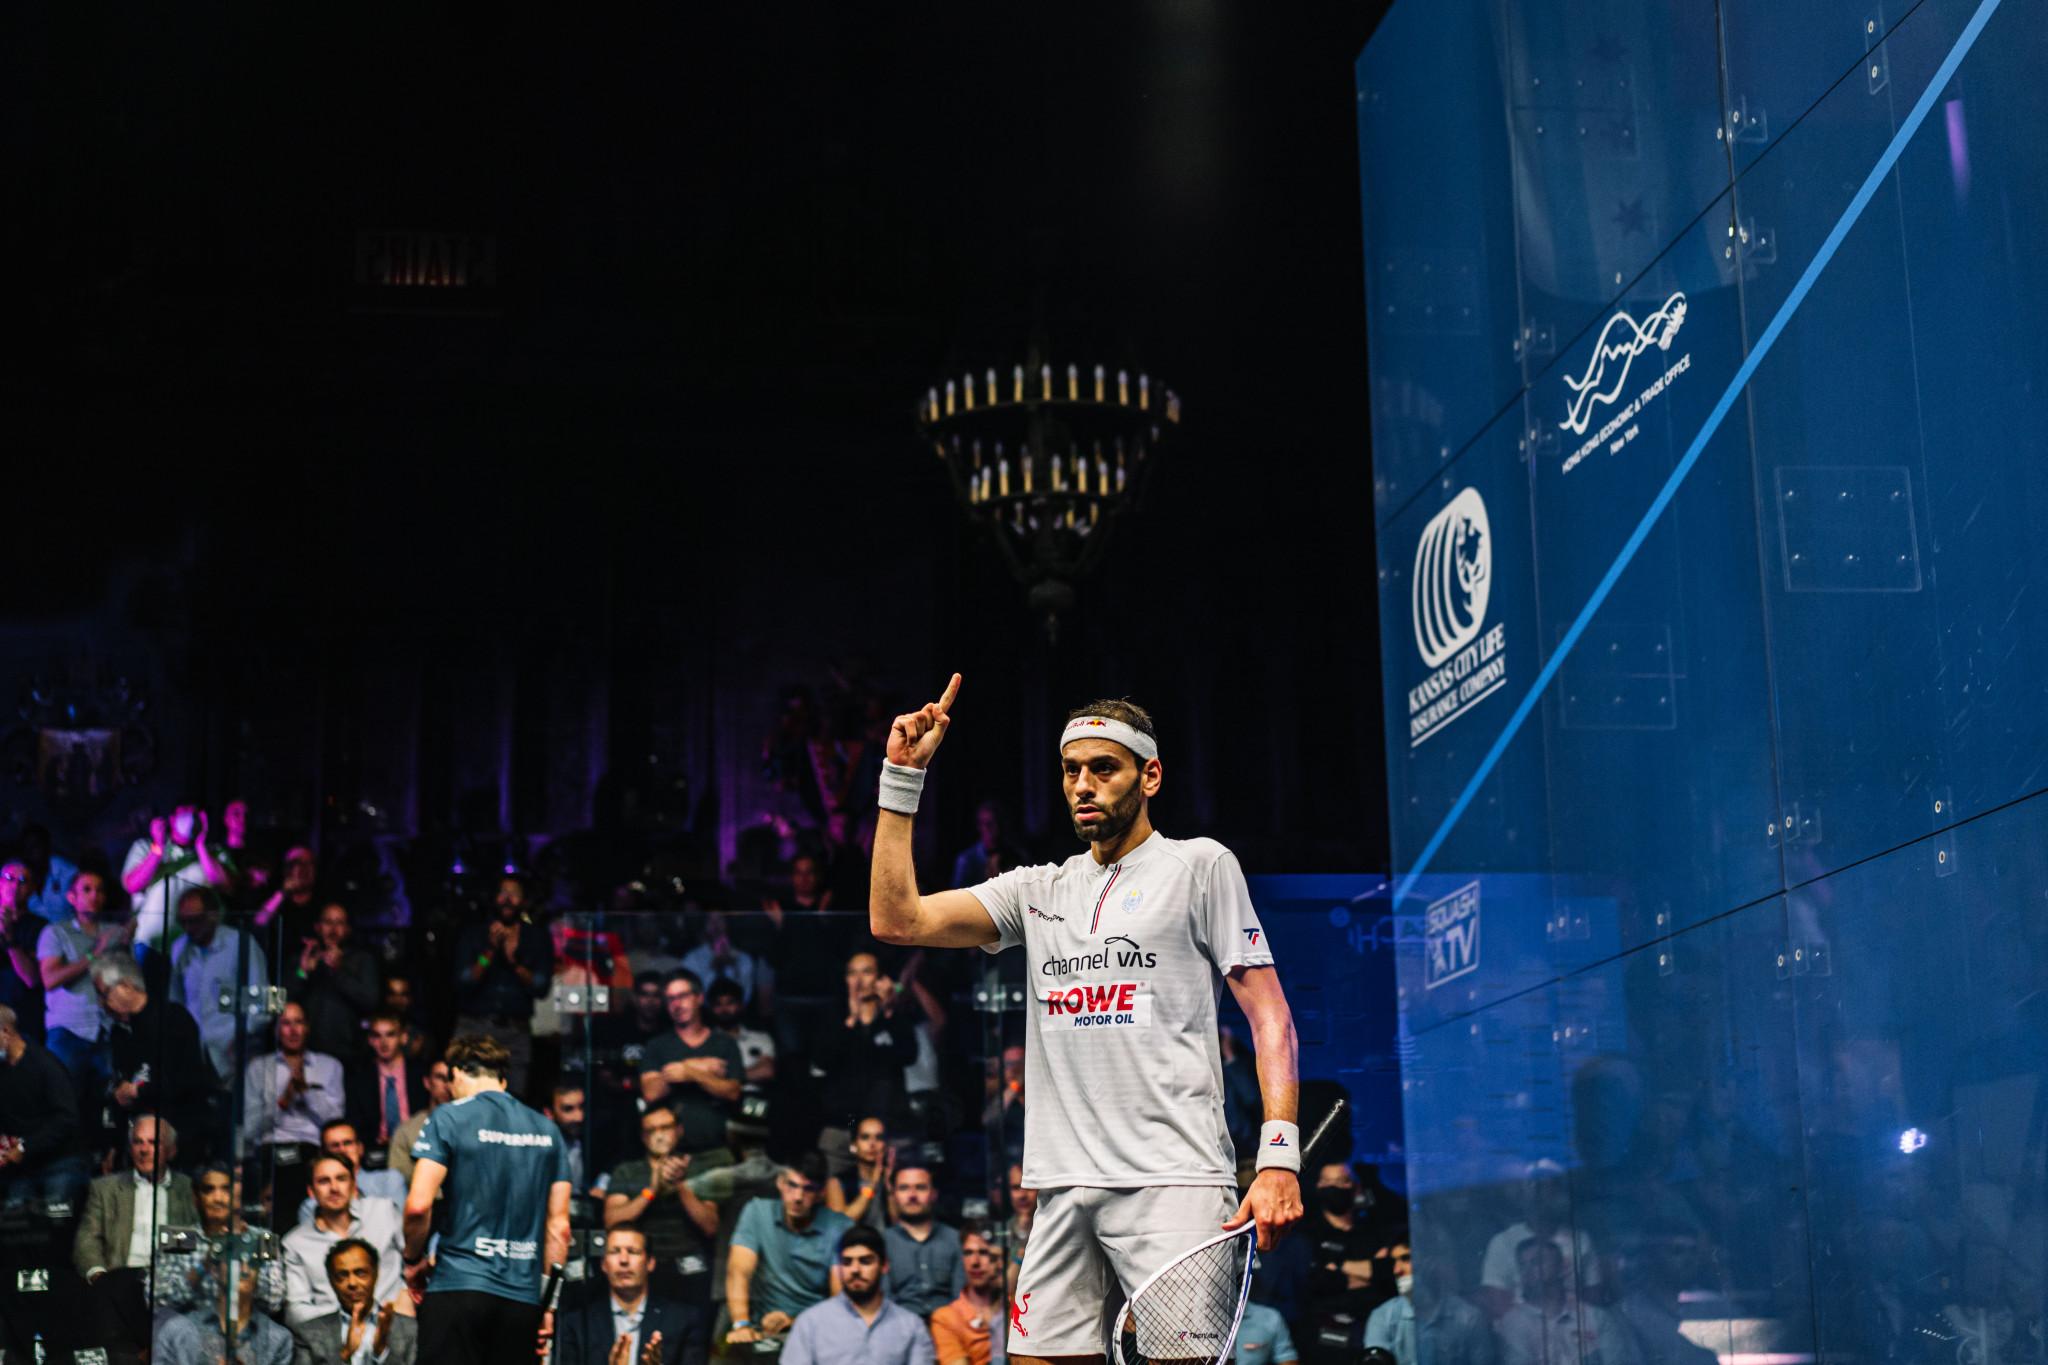 ElShorbagy takes over as men's number one in latest PSA world rankings